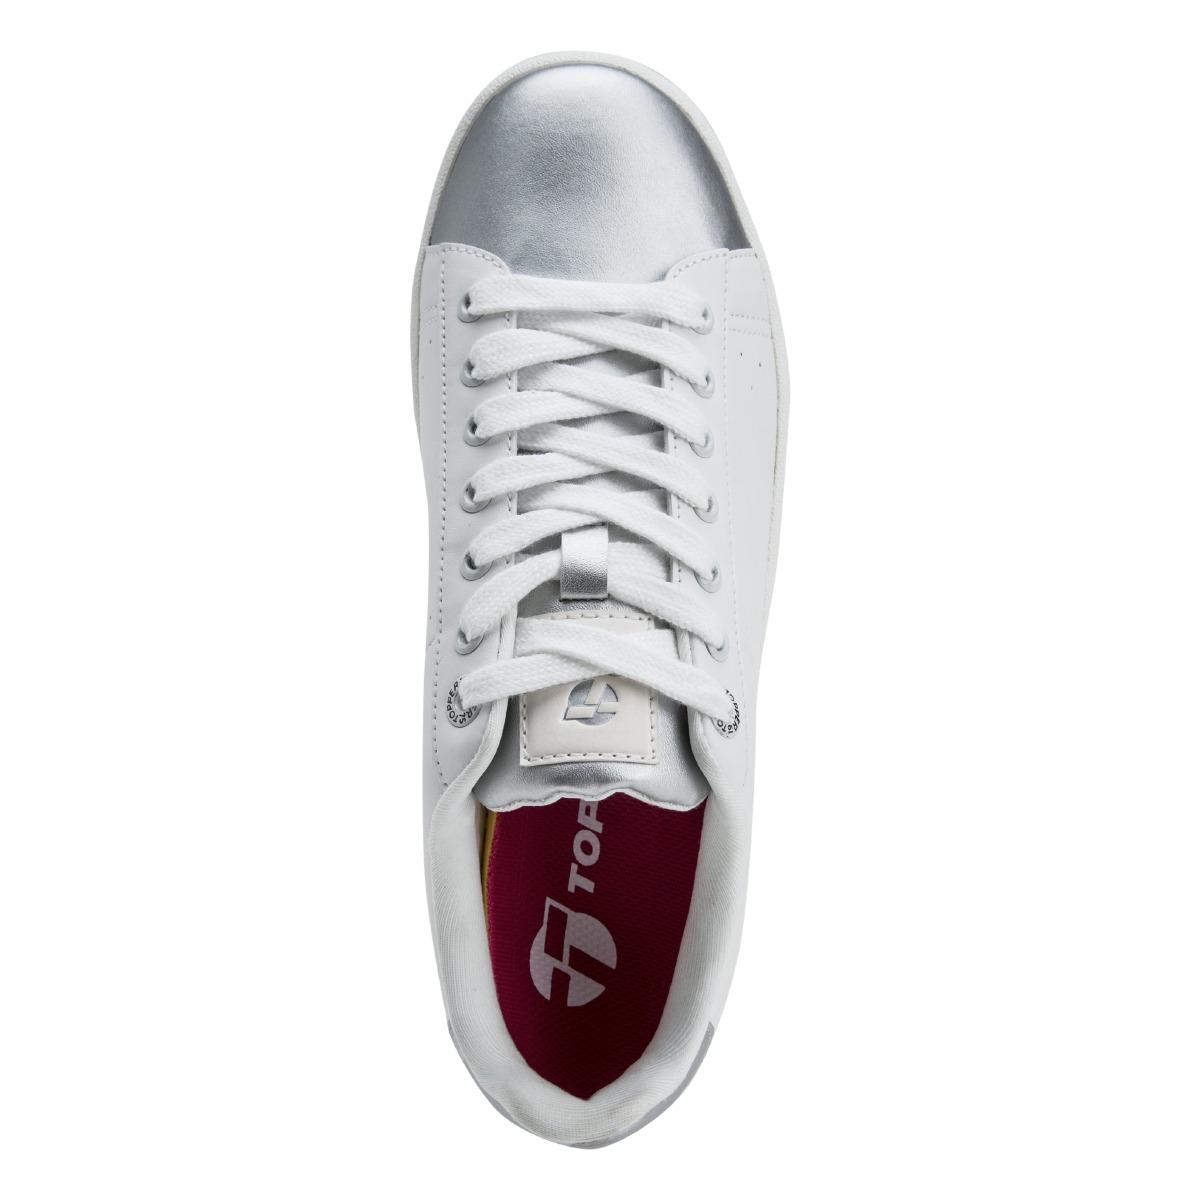 0df7c9a40f zapatillas topper candy remix mujer. Cargando zoom.